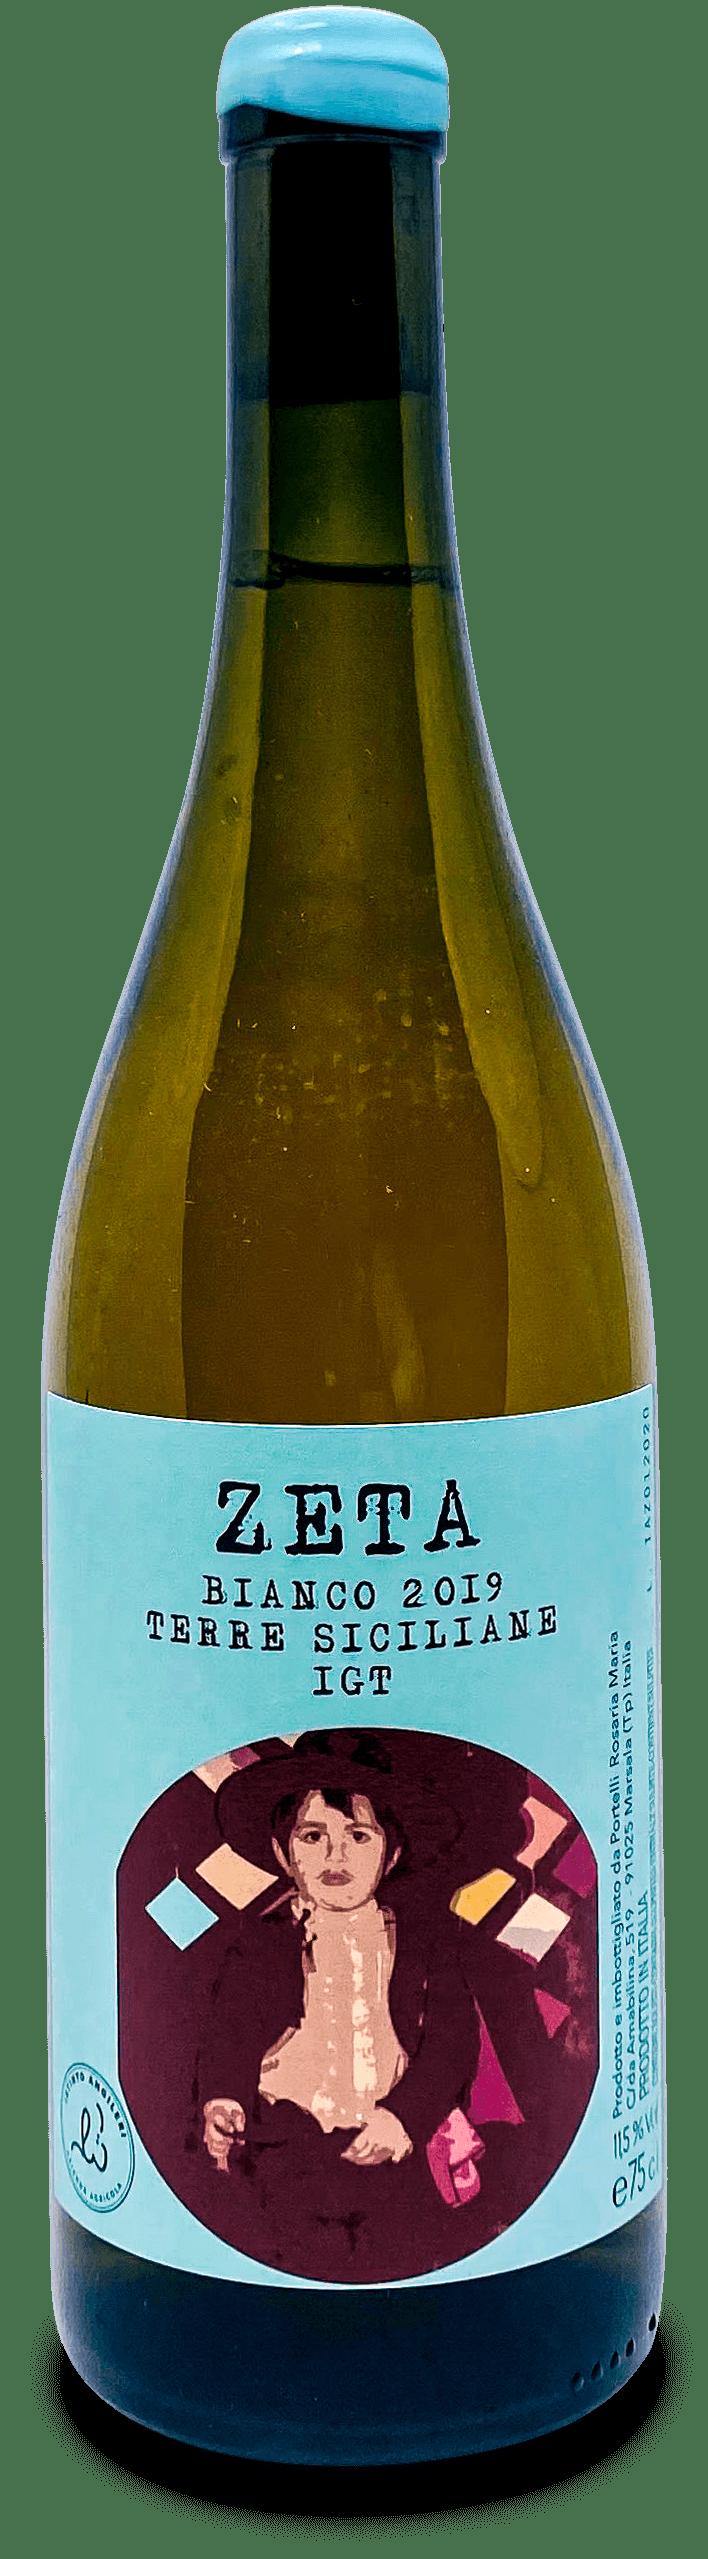 Zeta Bianco - Vinsupernaturel